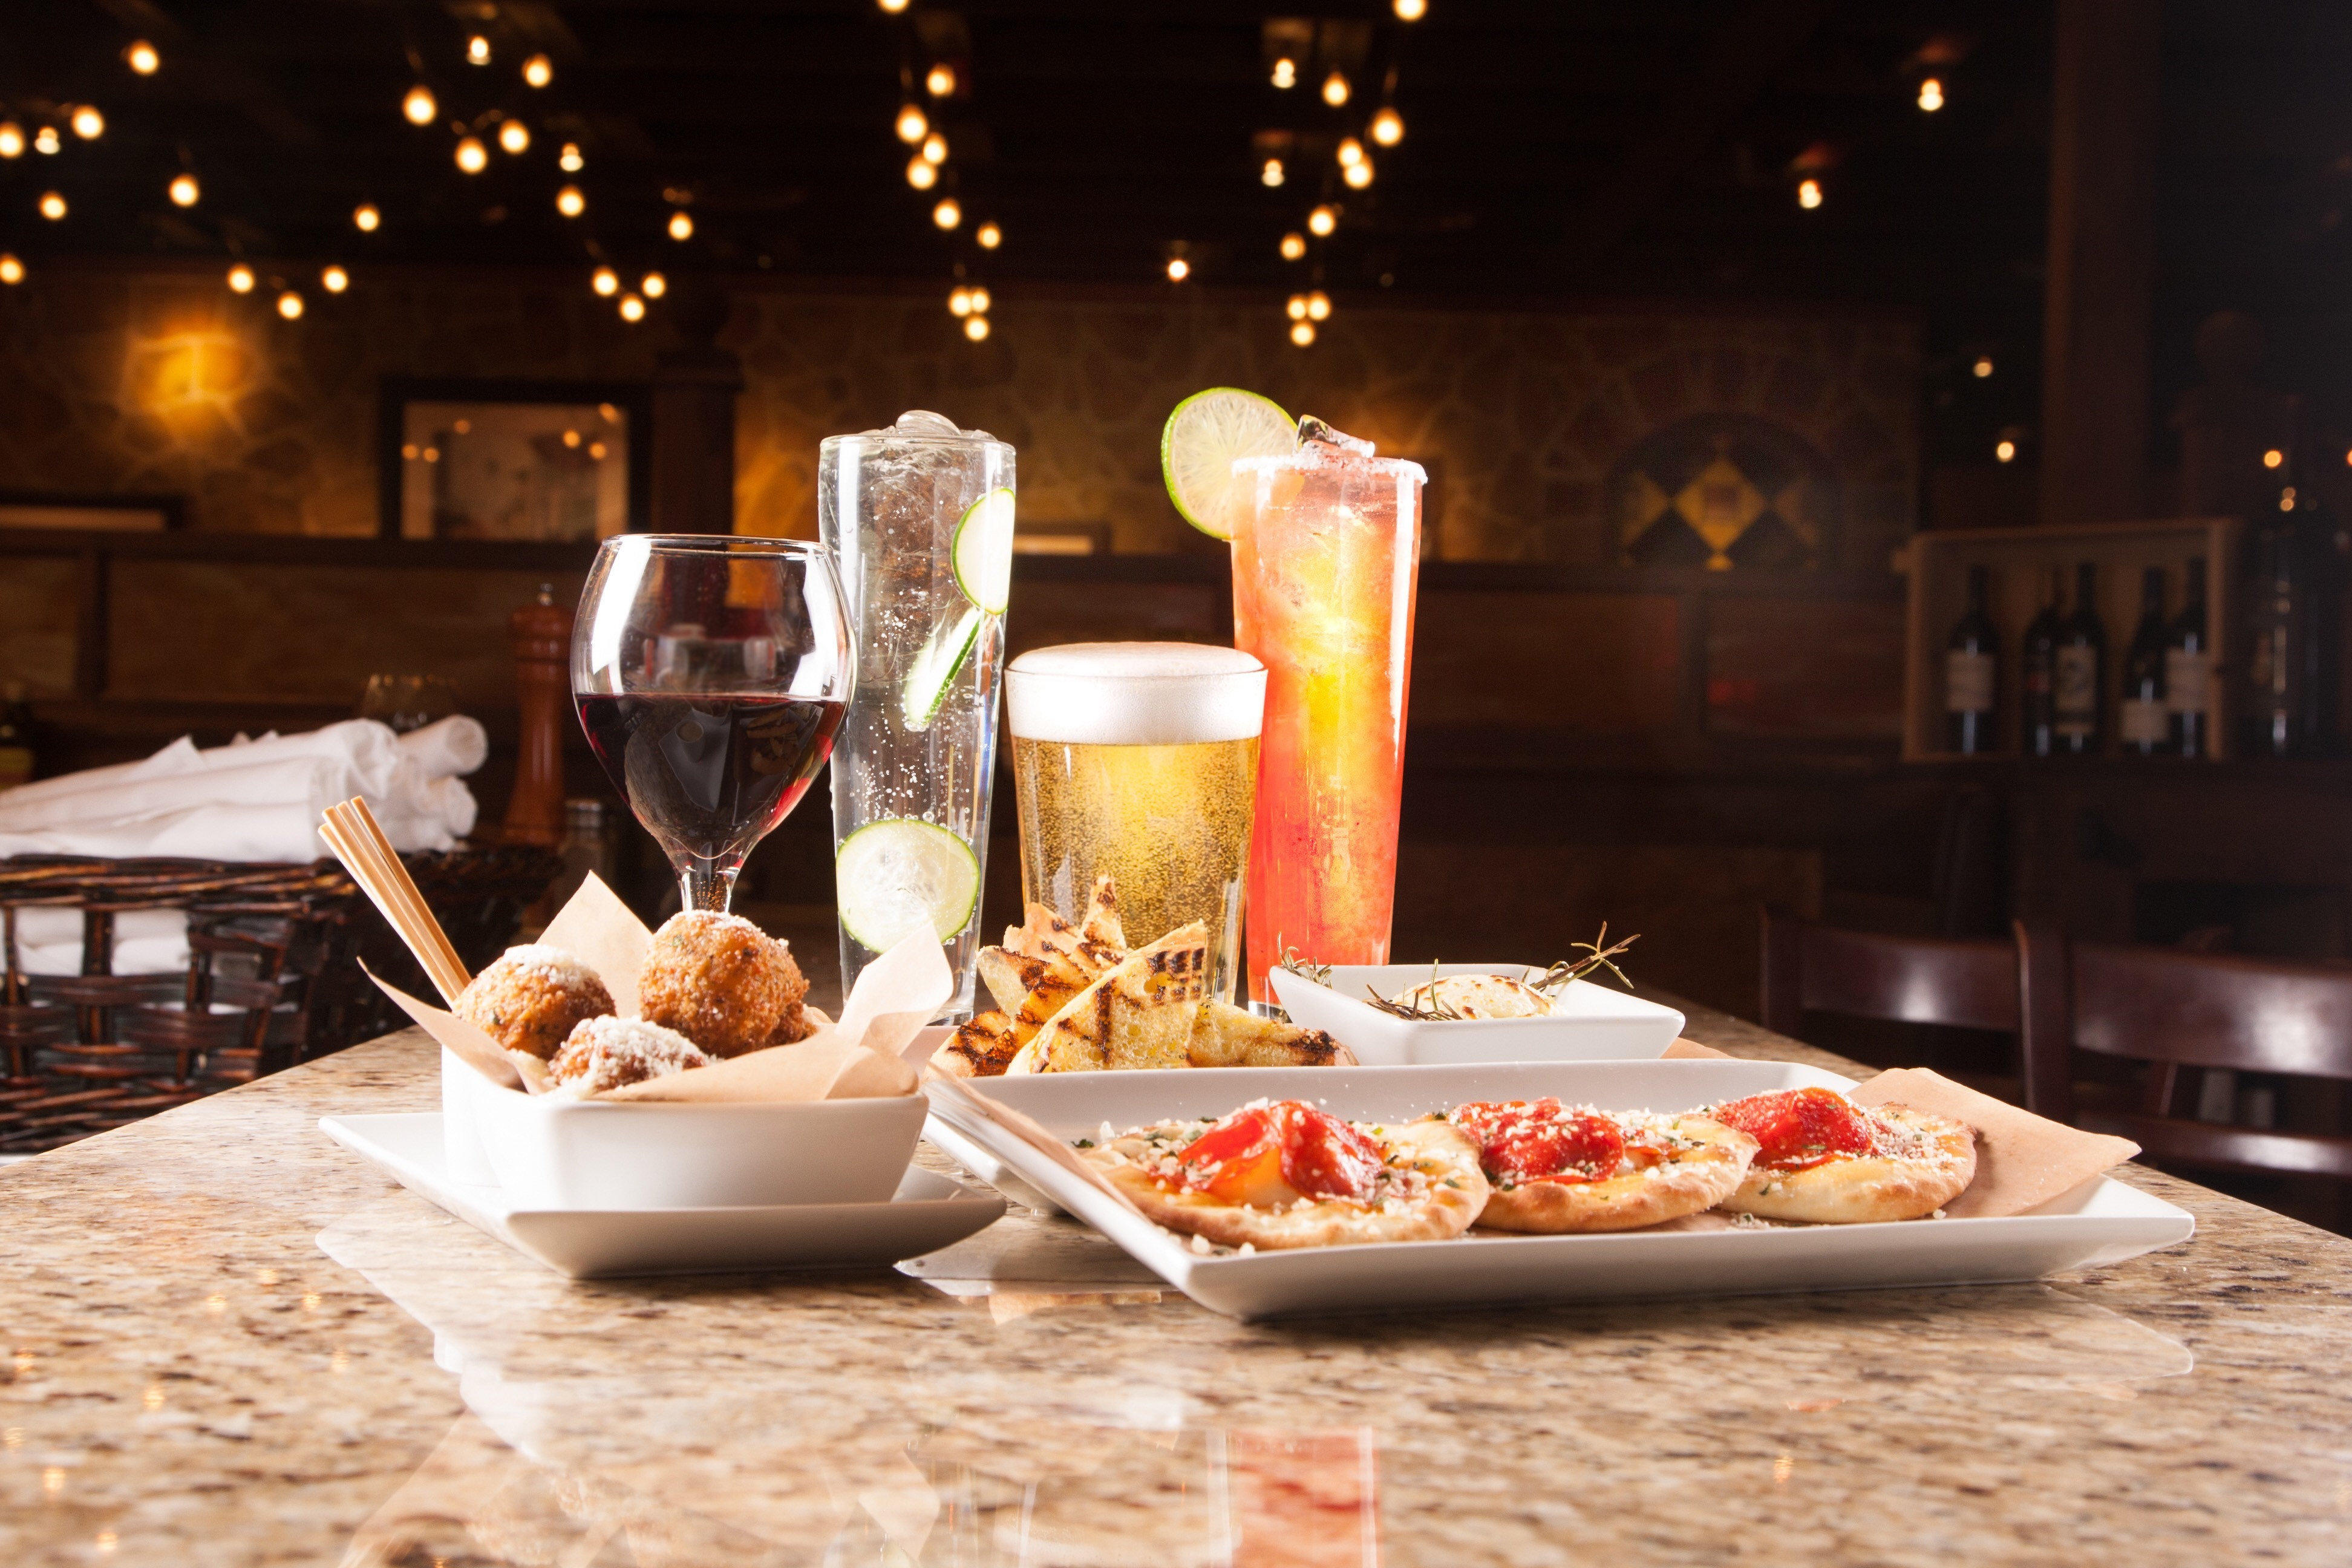 romano u0026 39 s macaroni grill launches new happy hour menu